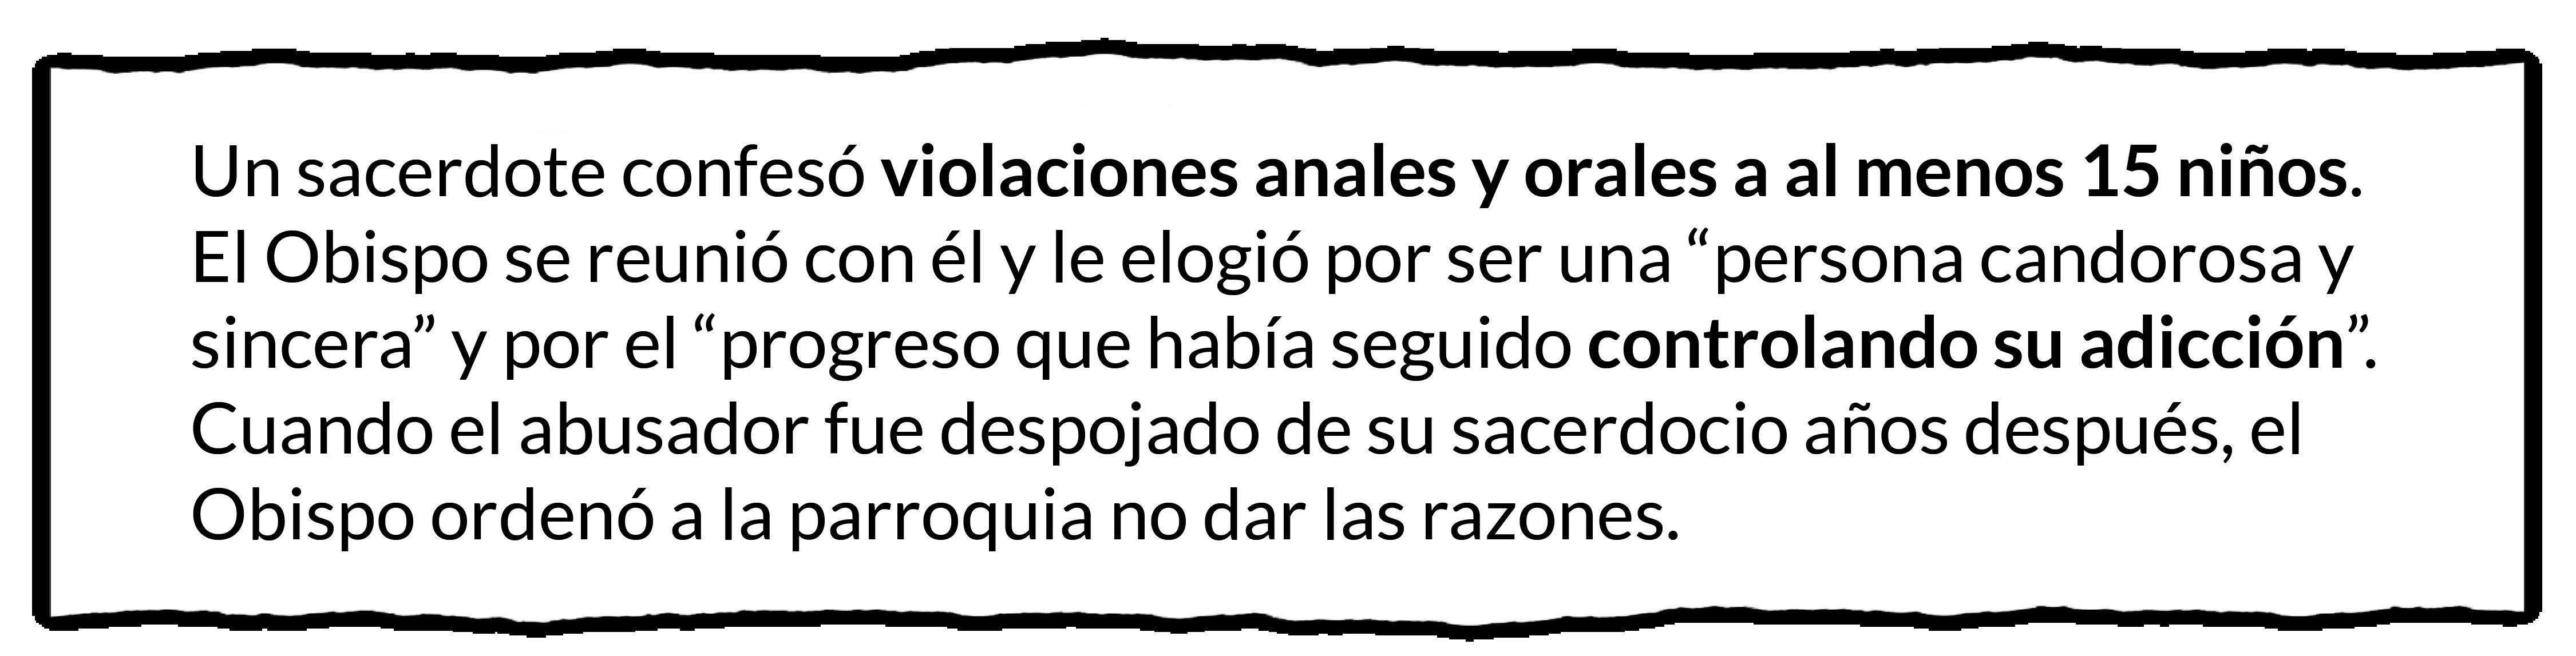 20180815_playbook_iglesia-02